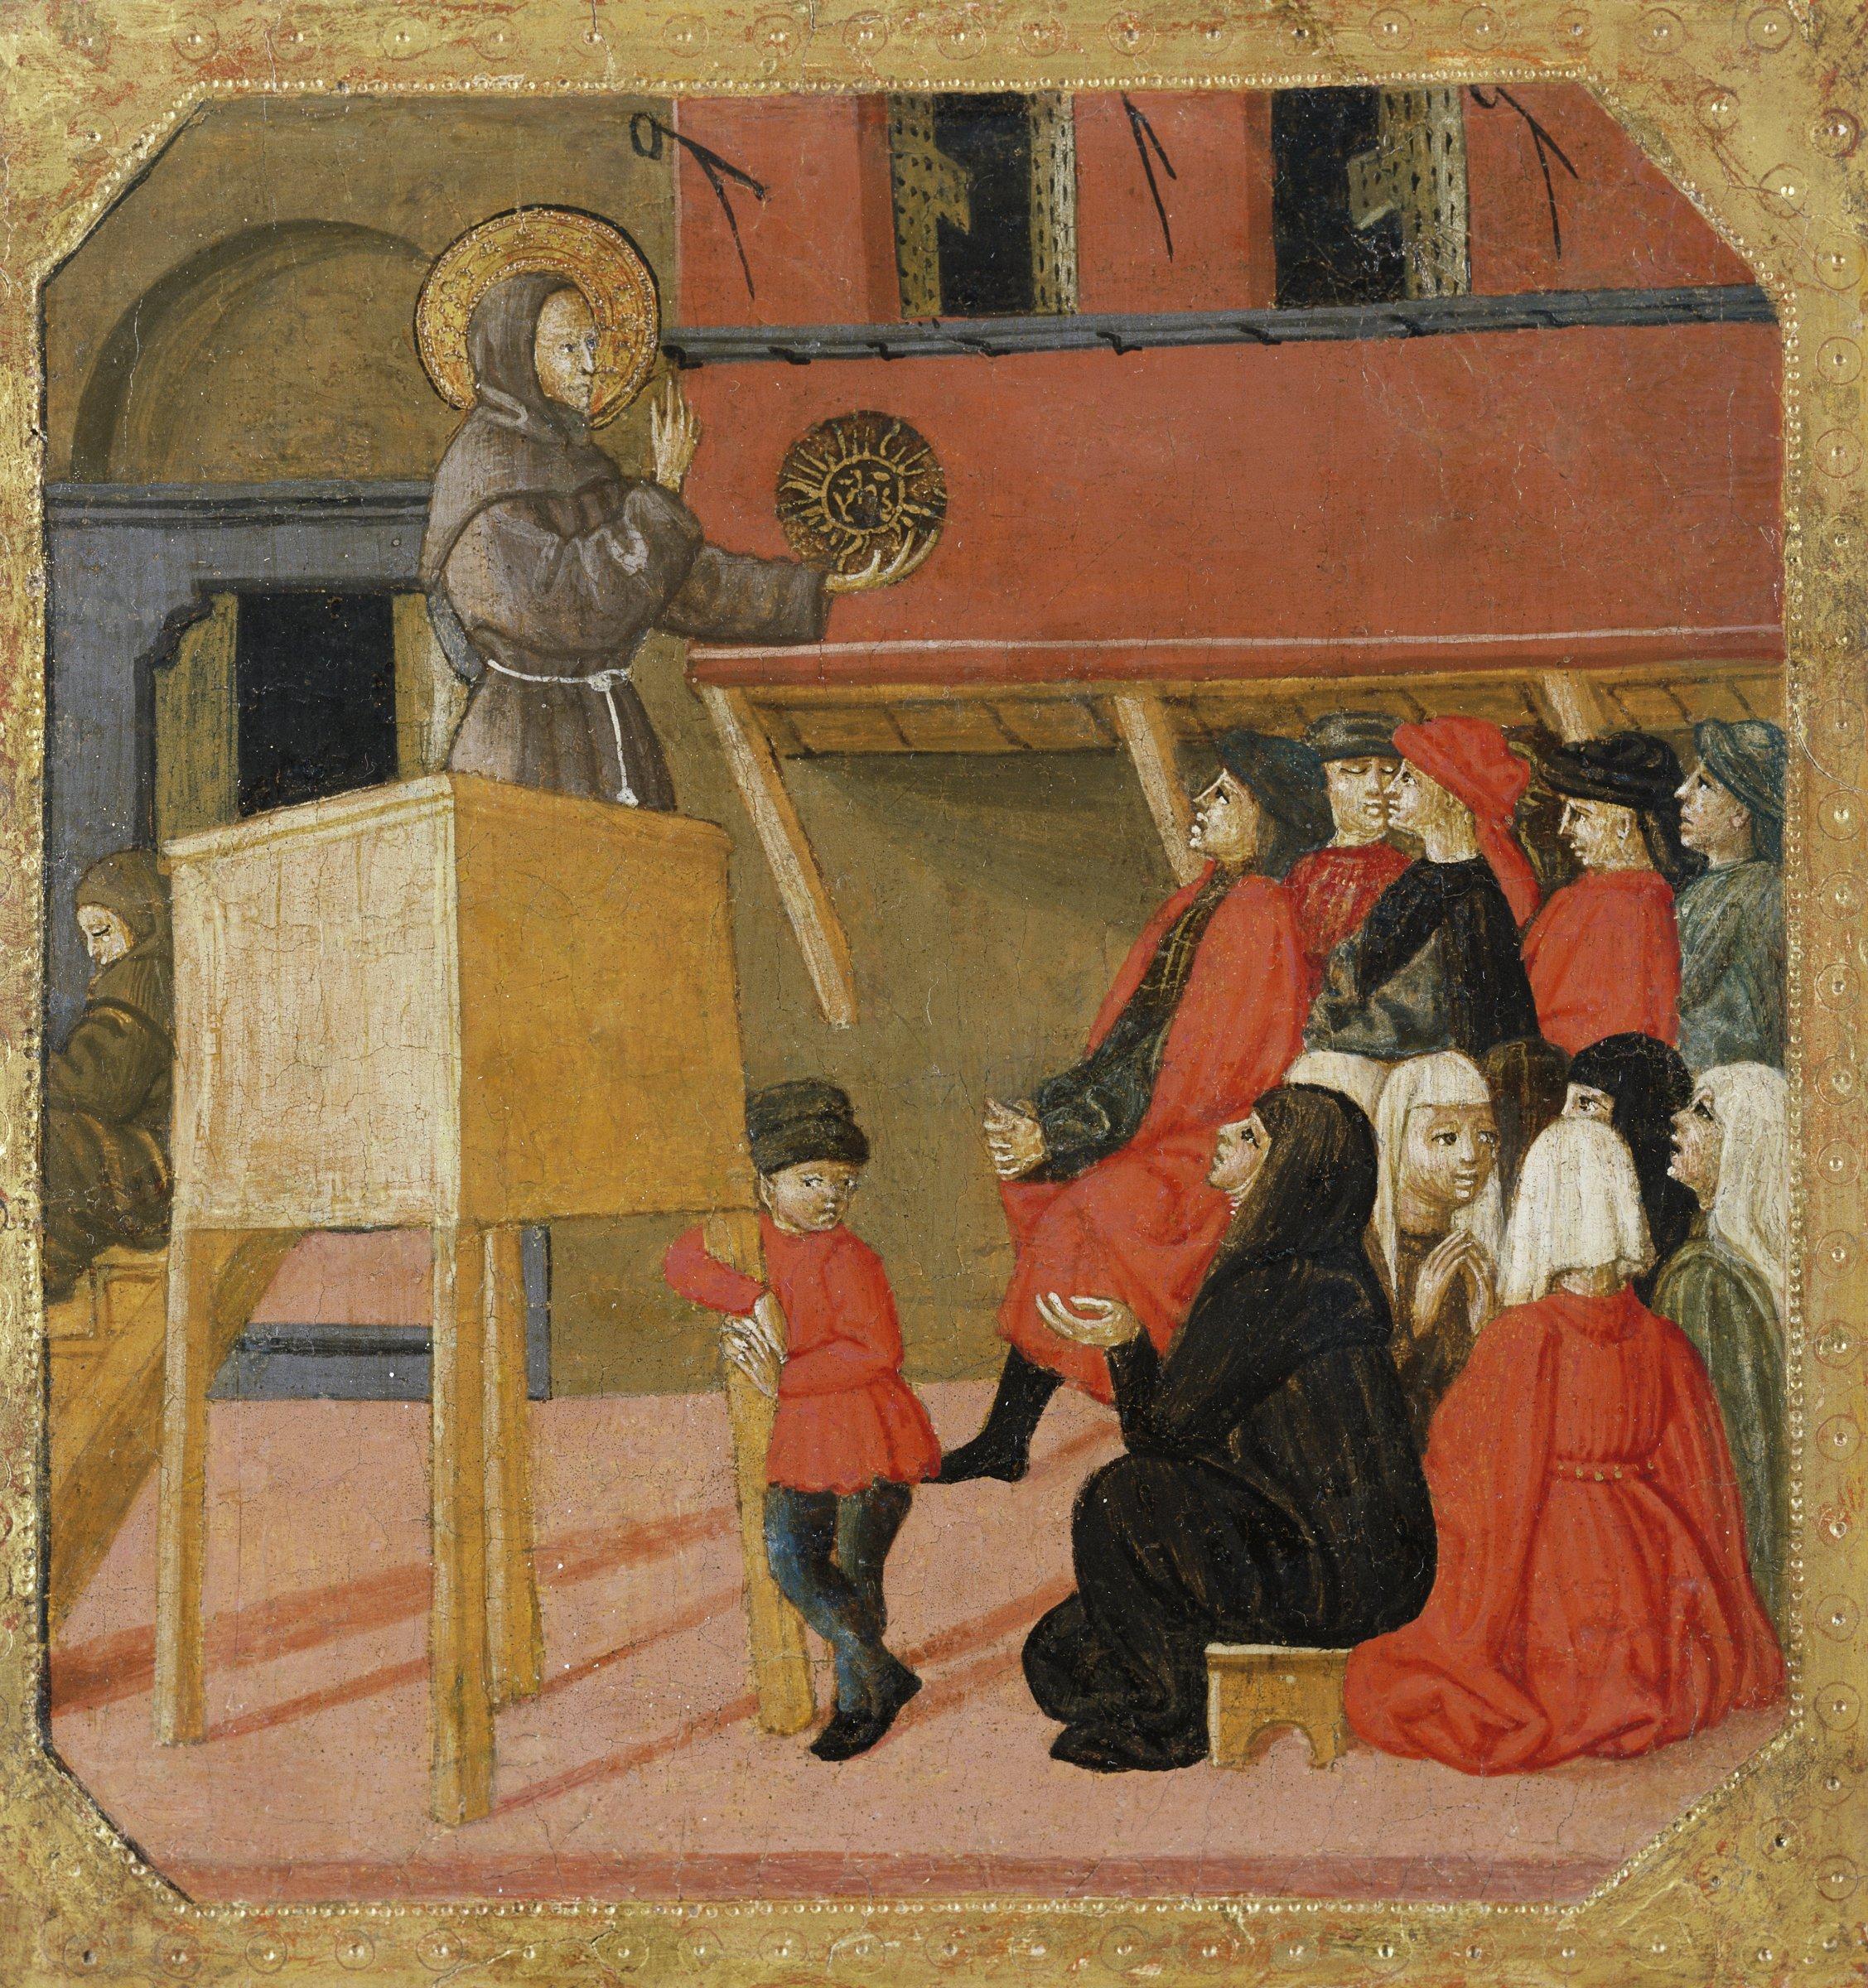 Saint Bernardino stands in a pulpit, preaching to the church-goers below.